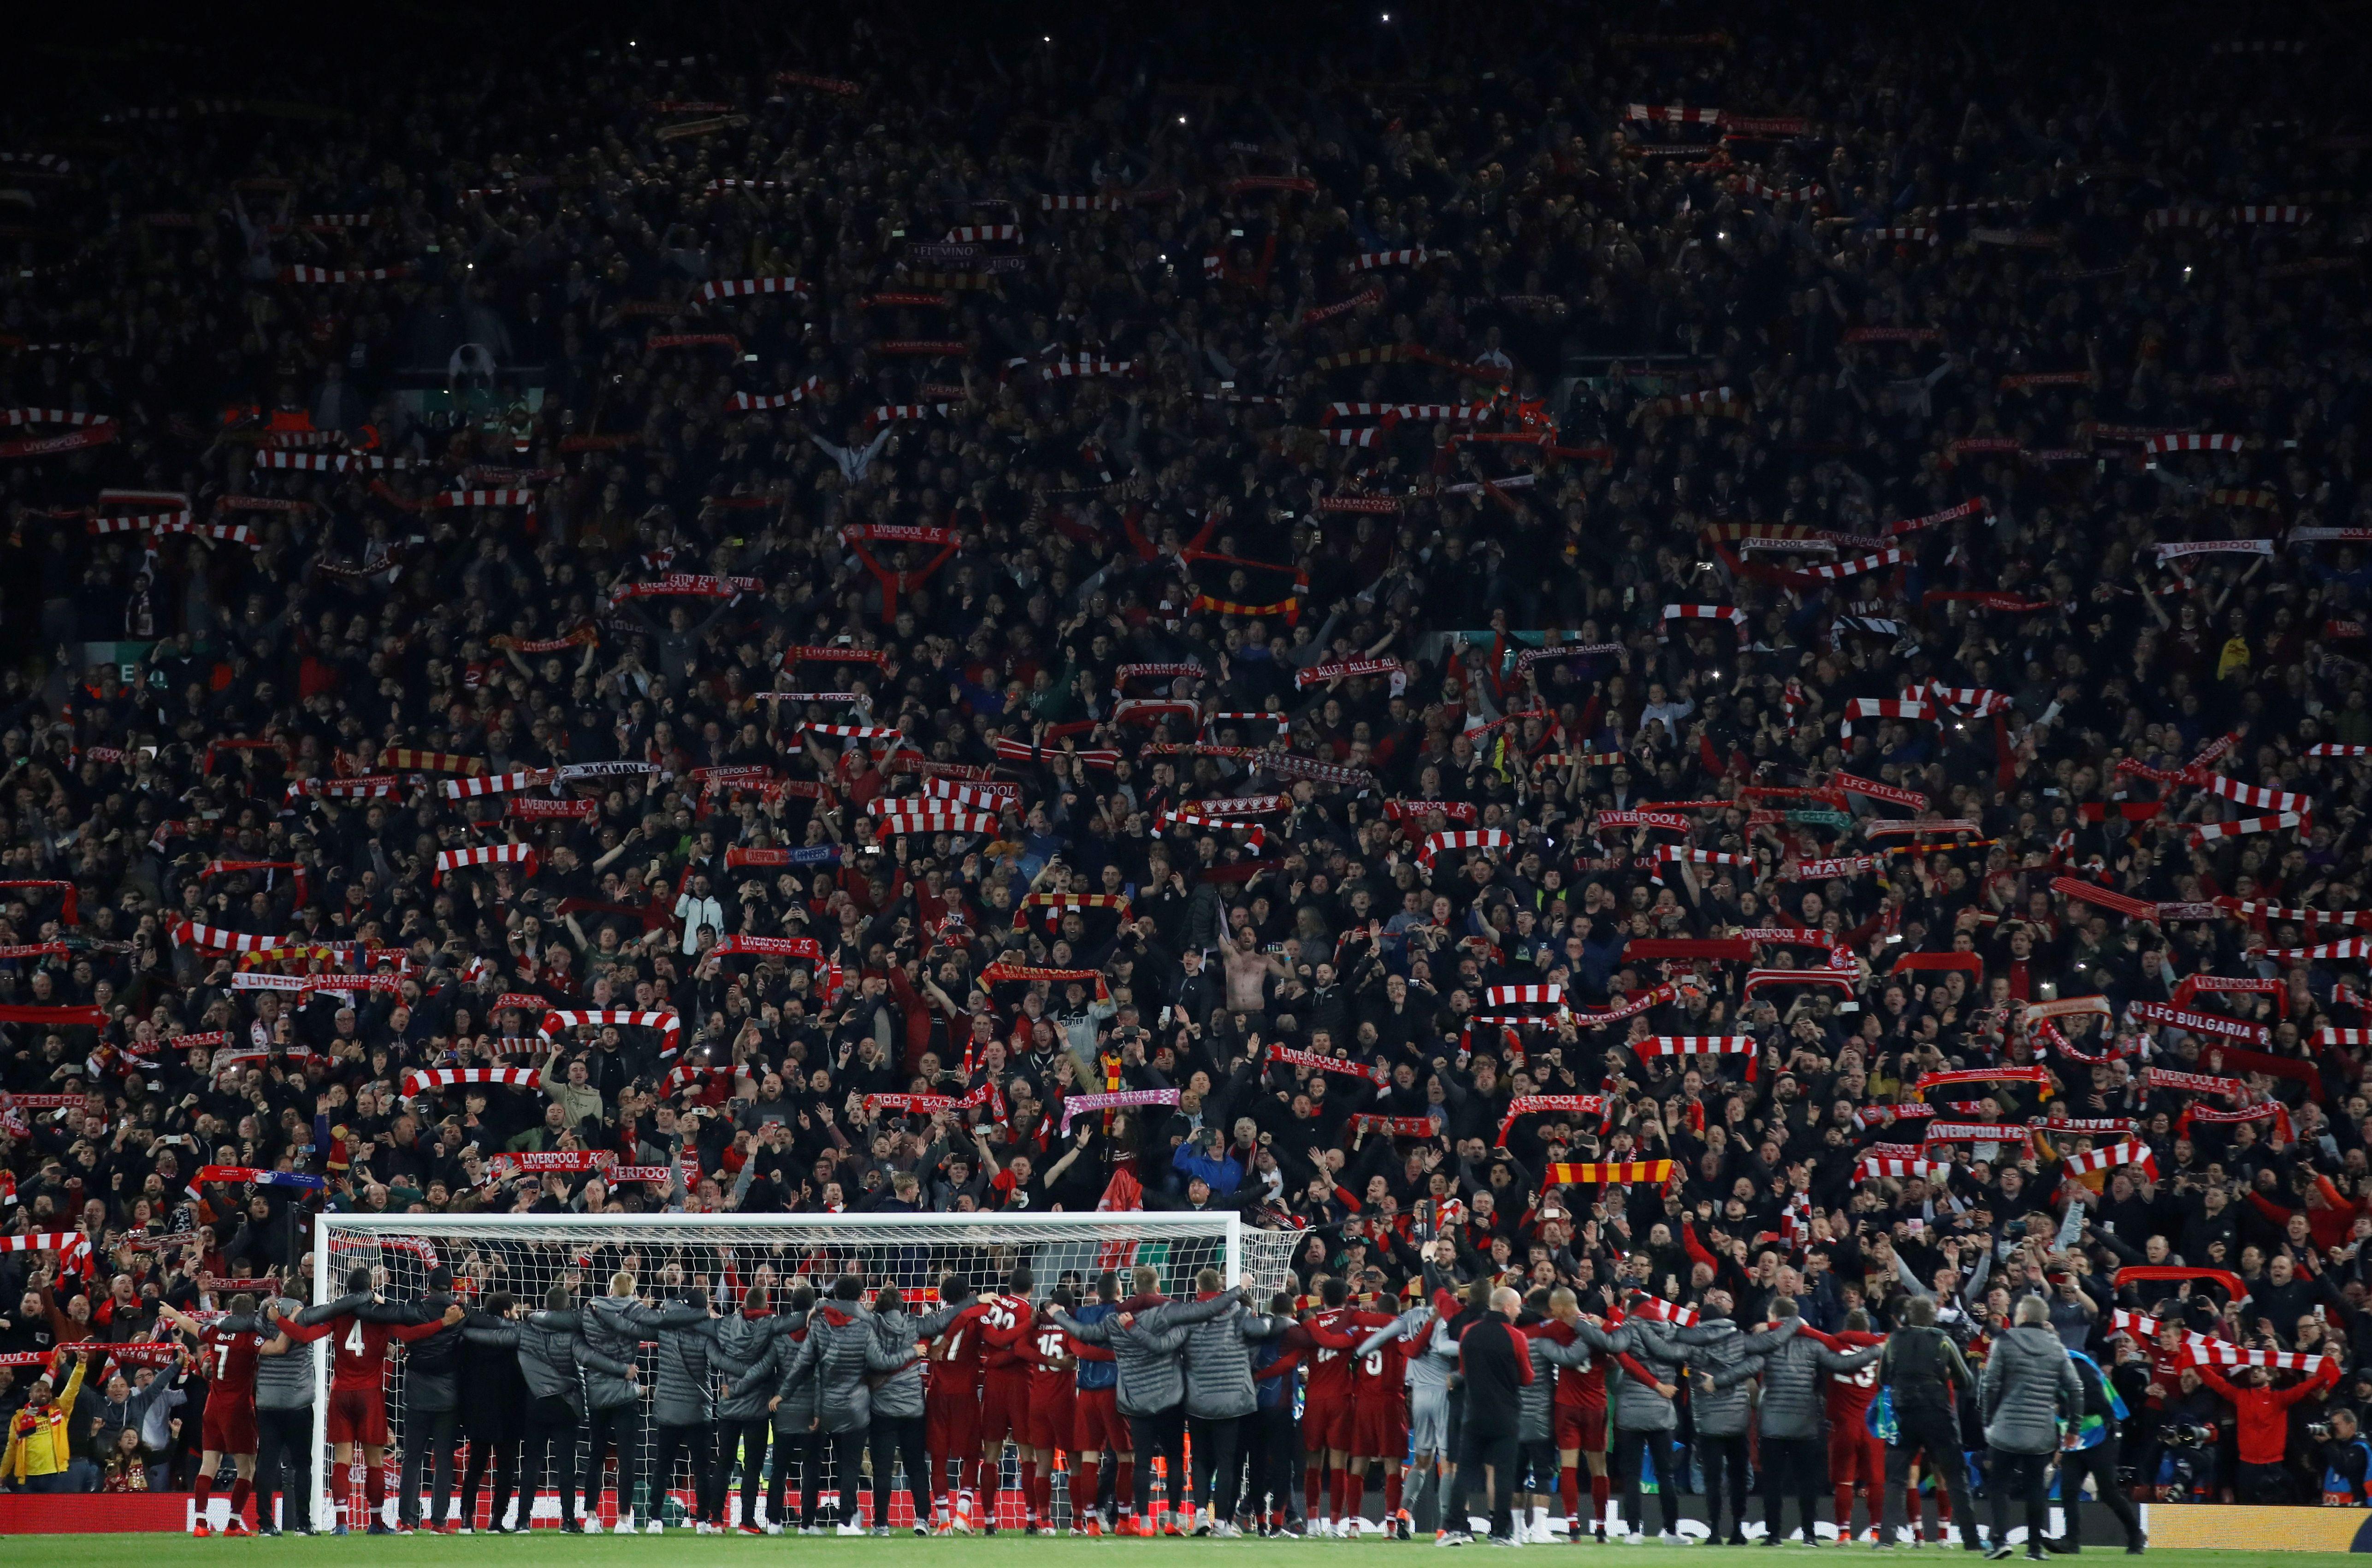 Football - Ligue des champions - Liverpool : d'où vient le chant «You'll never walk alone» ?